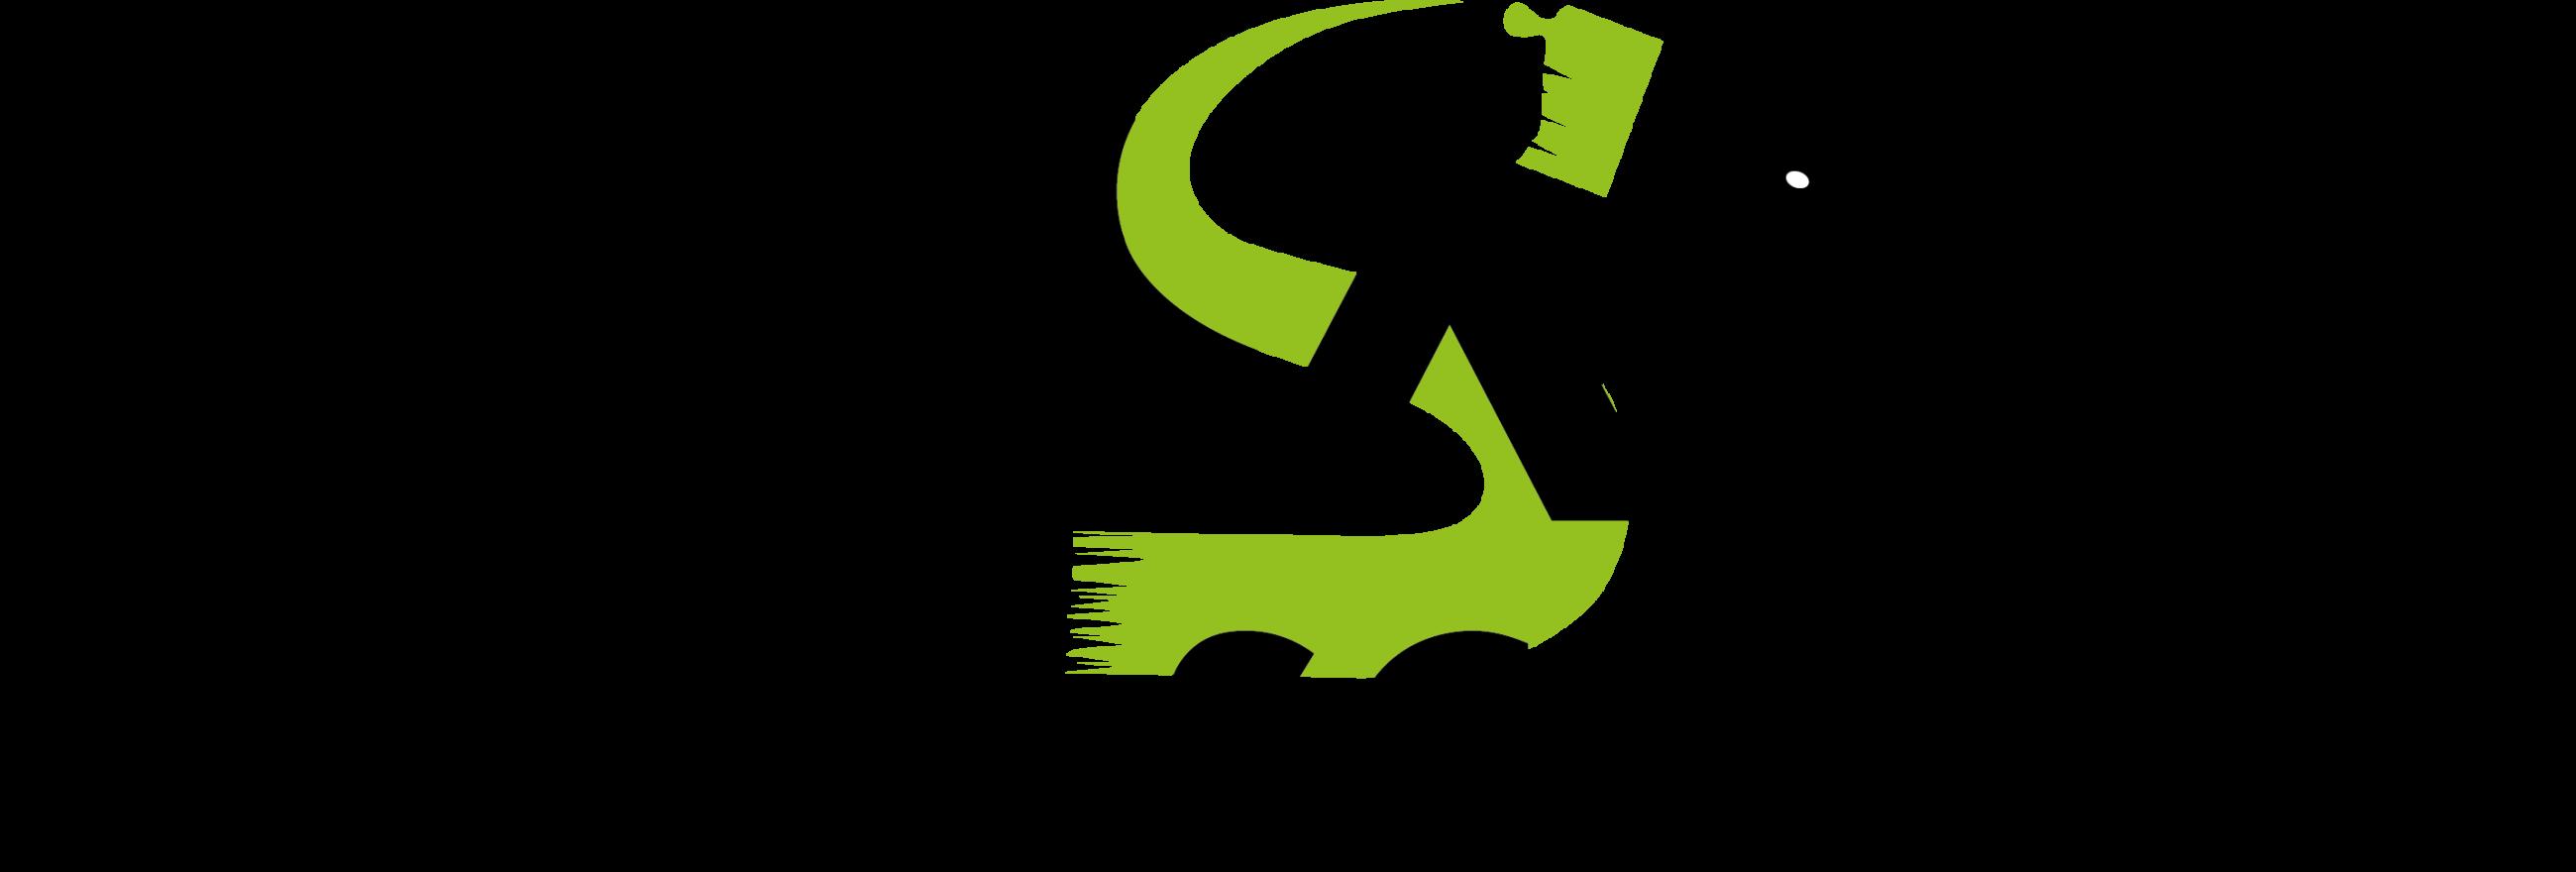 Maler Schäfer Logo